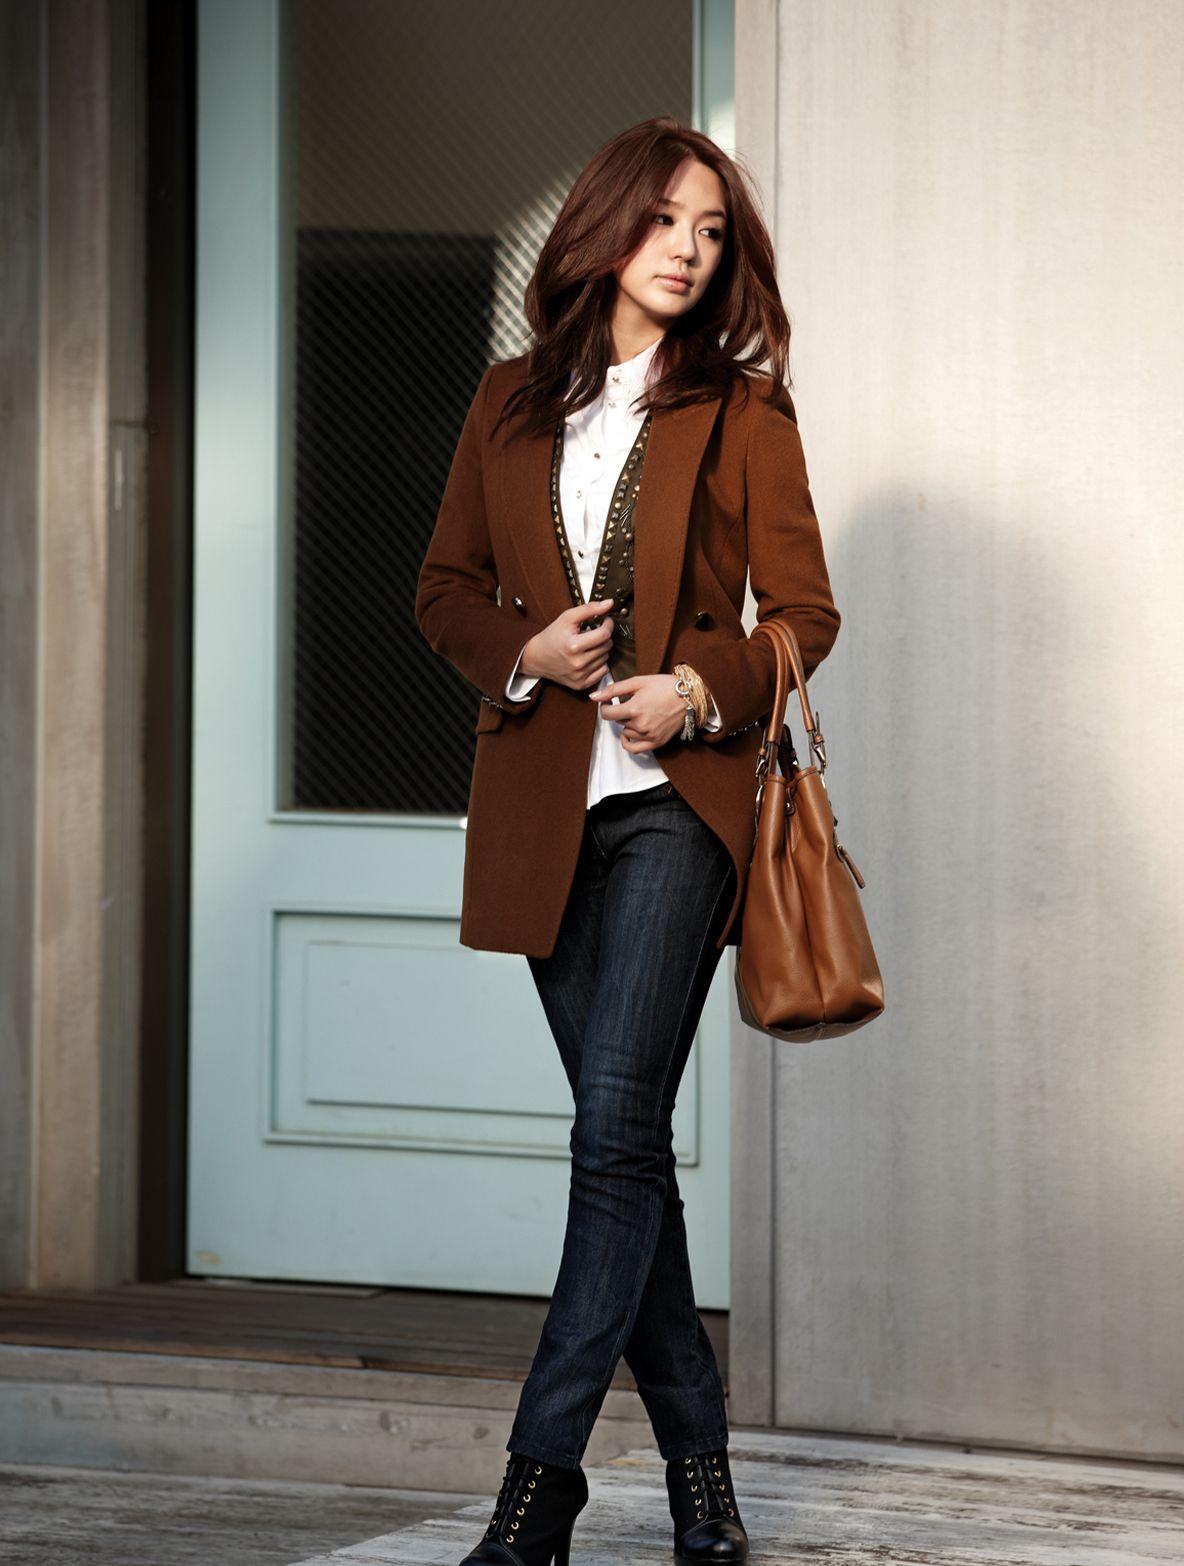 Yoon eun hye fashion yoon eun hye Yoon eun hye fashion style in my fair lady